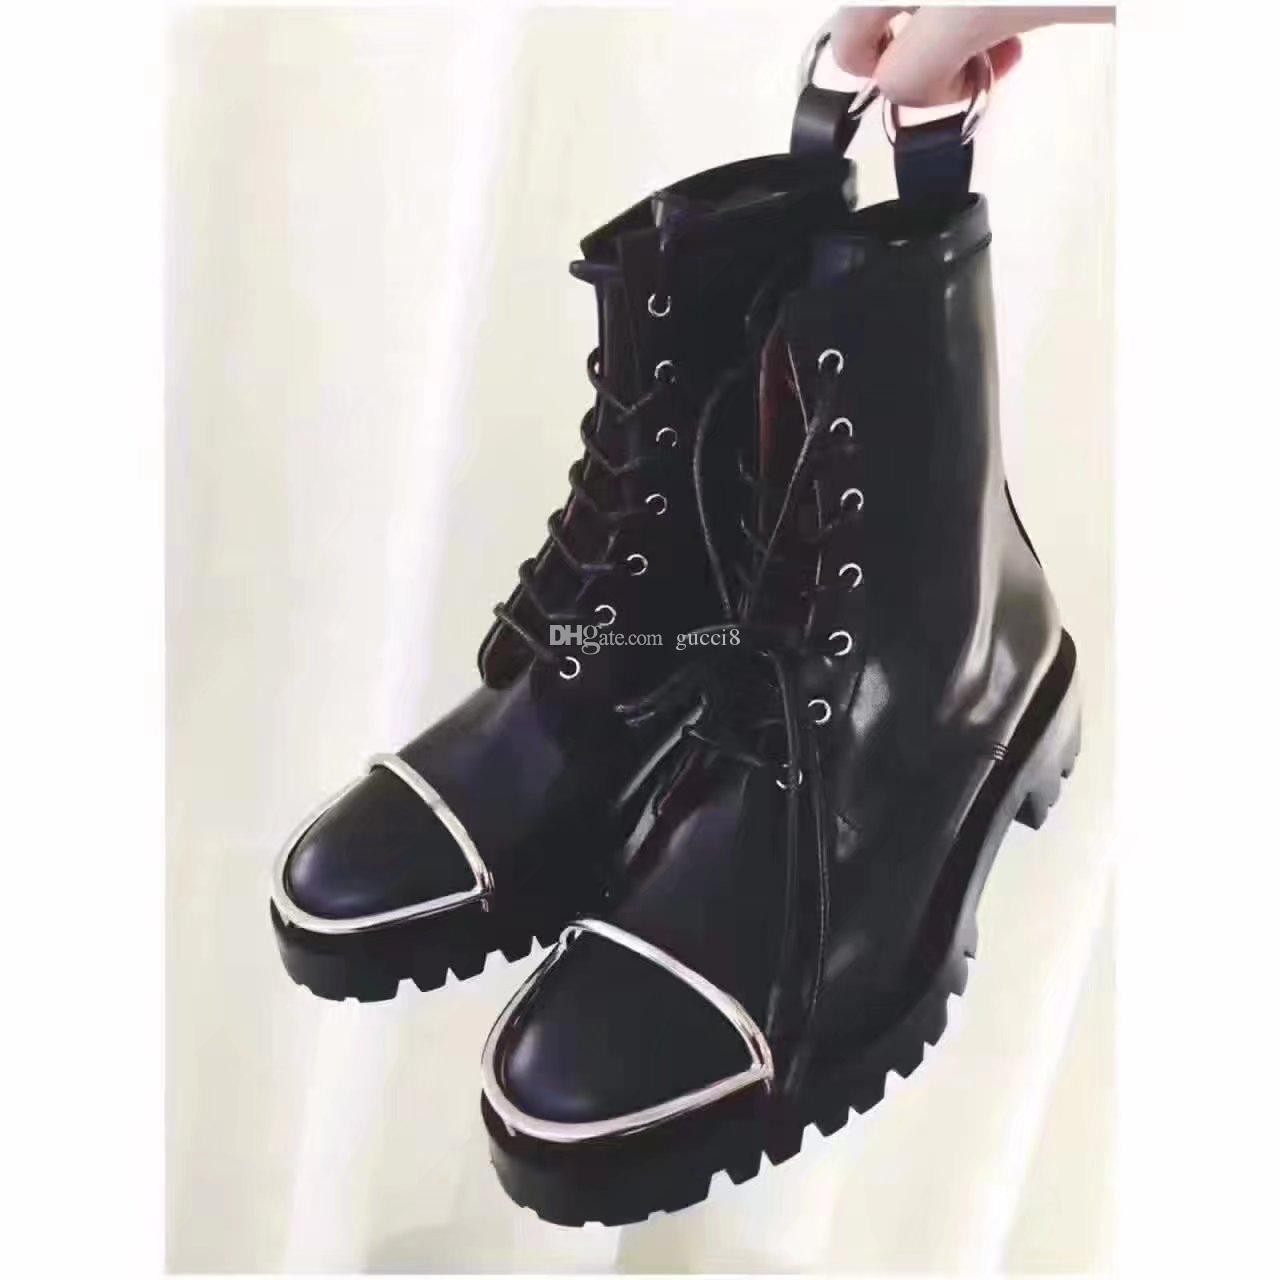 womens combat boots new 2018 fall winter black flats